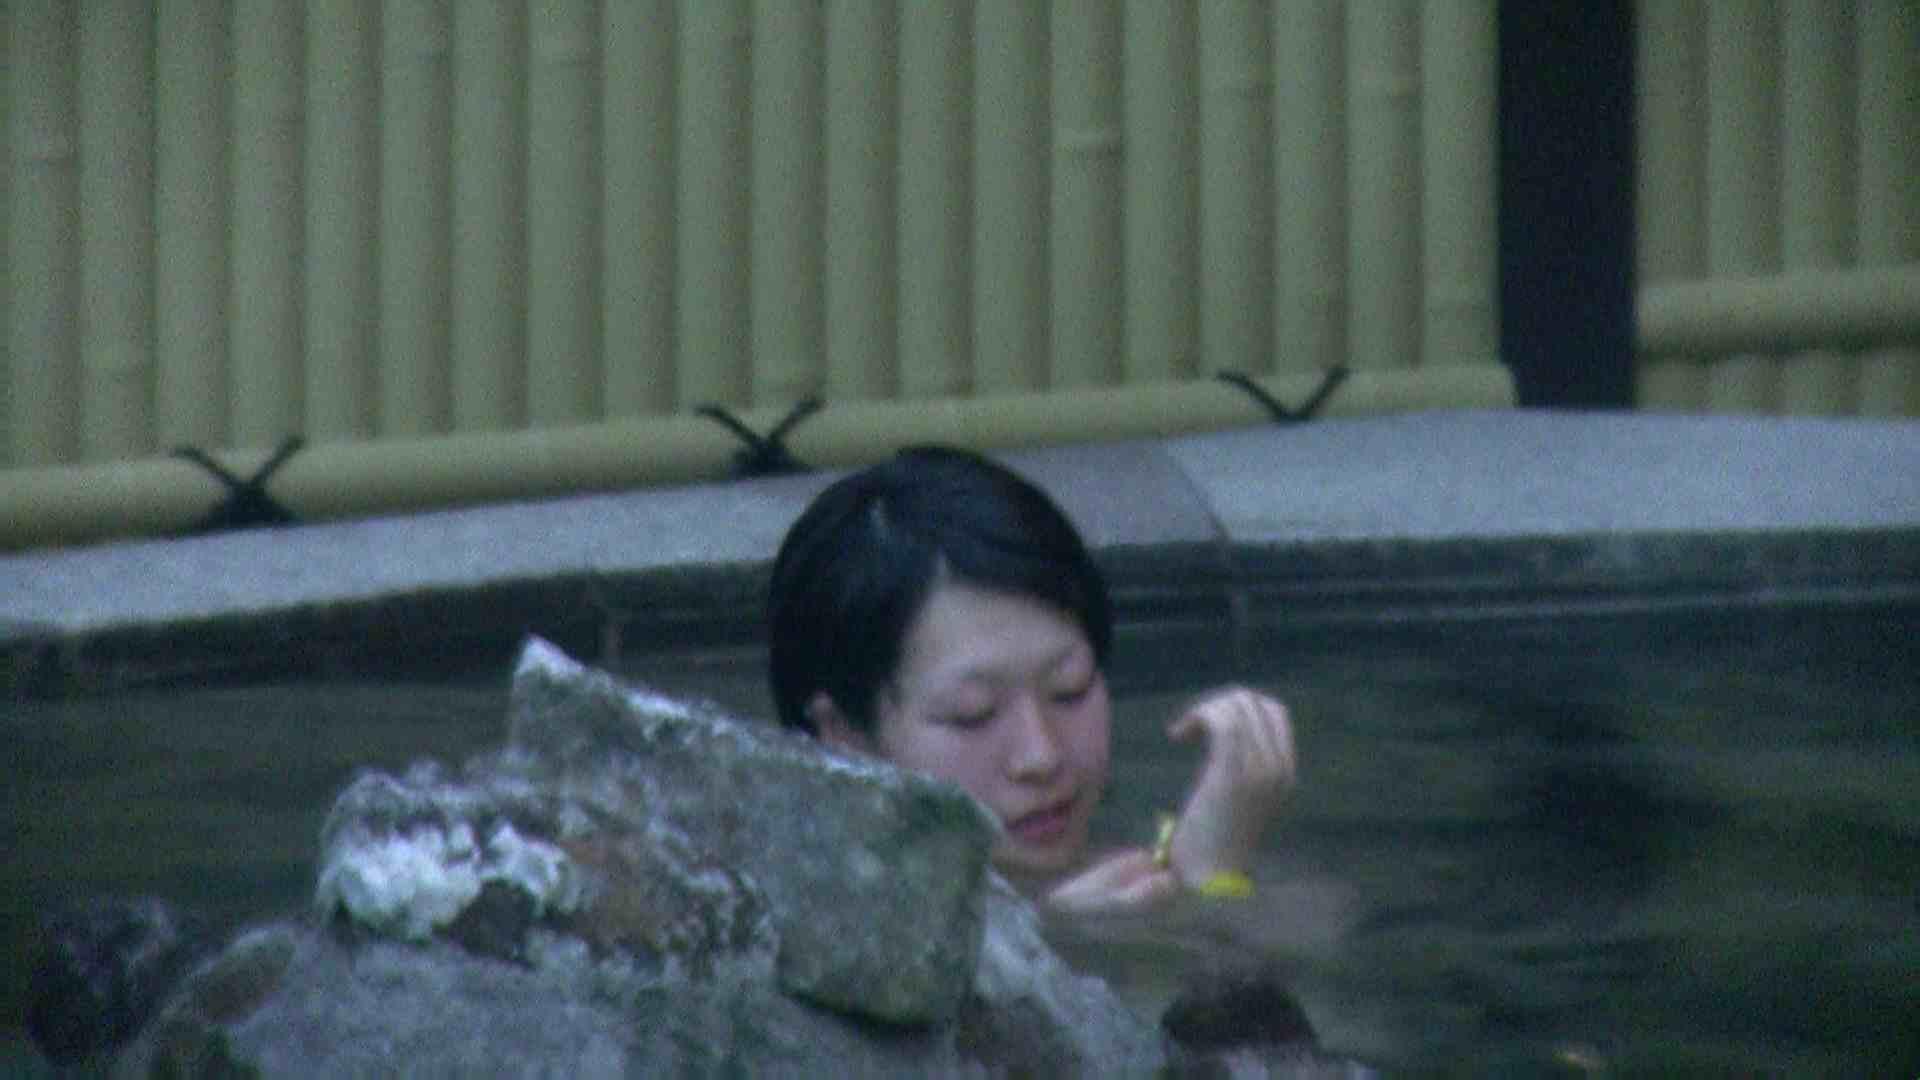 Aquaな露天風呂Vol.05【VIP】 0 | 露天  65連発 5